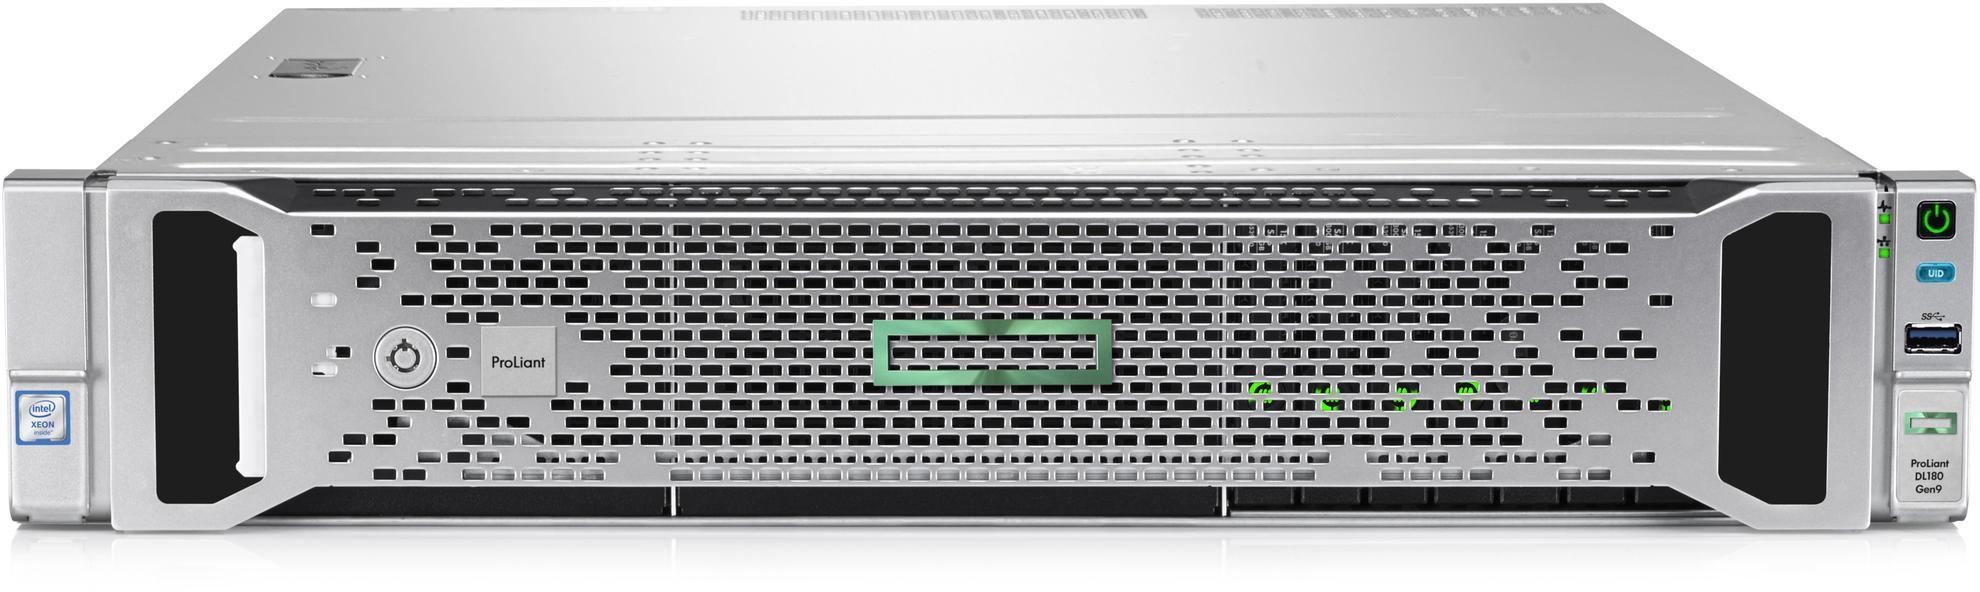 Сервер Proliant DL180 Gen9 E5-2620v3 Hot Plug Rack(2U)/Xeon6C 2.4GHz(15Mb)/1x16GbR2D_2133/P840FBWC(4